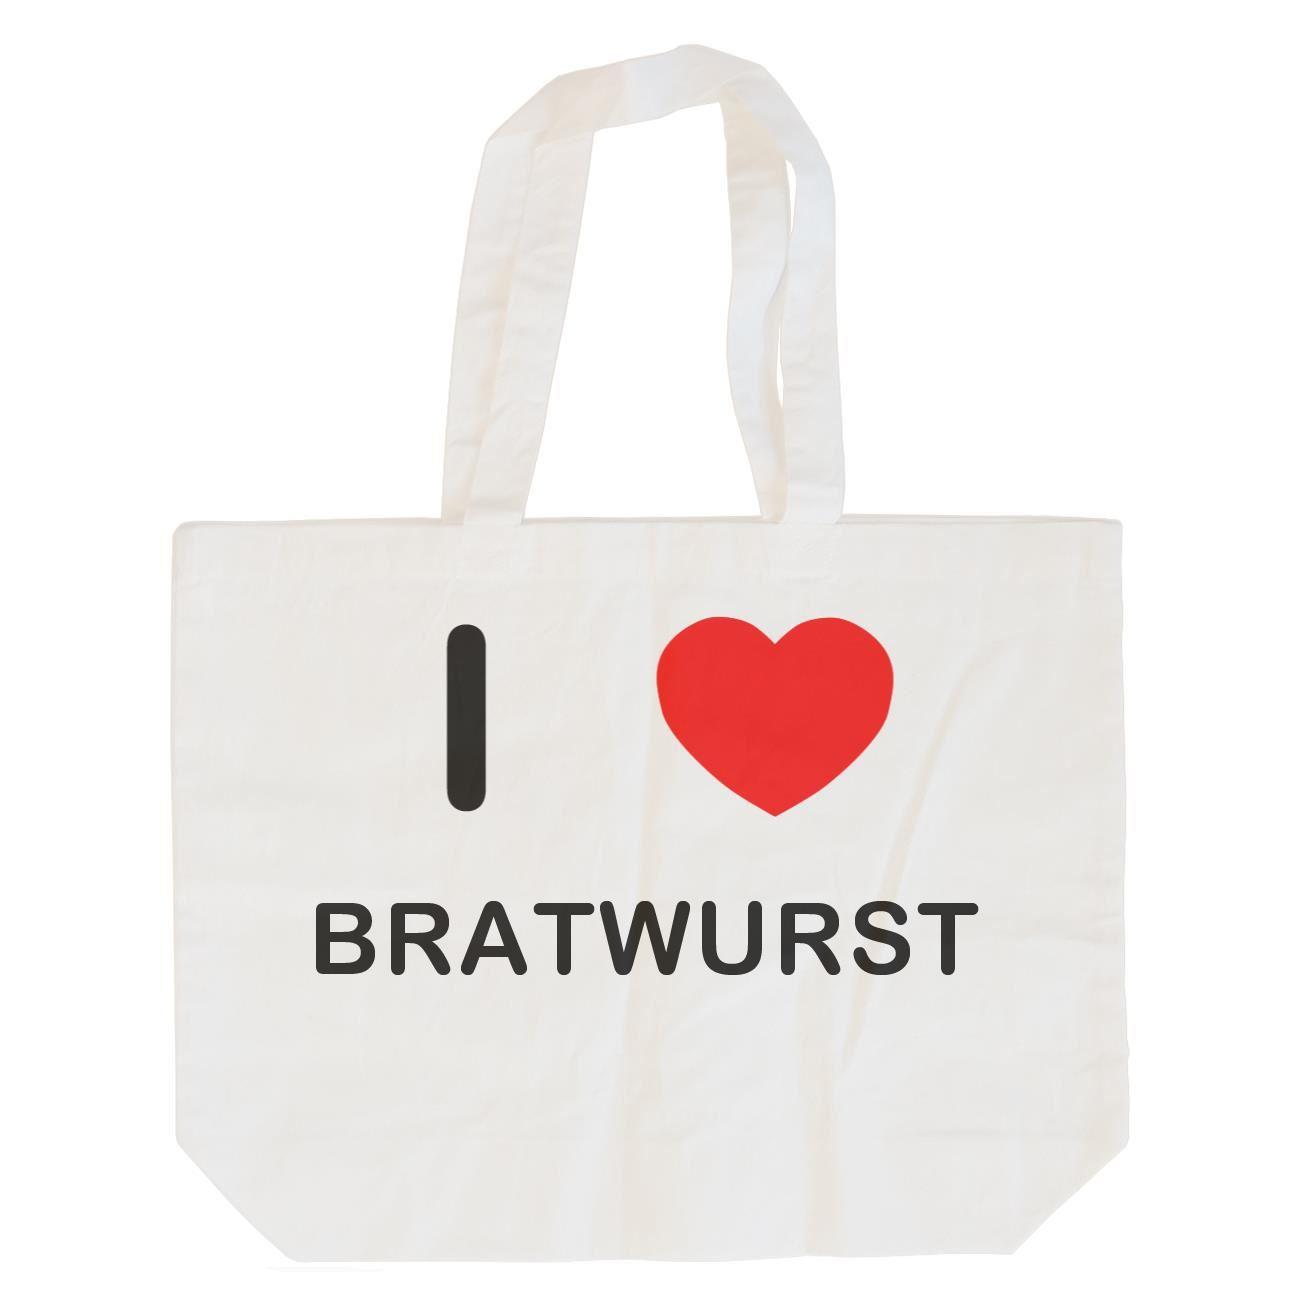 I Love Bratwurst - Cotton Bag | Size choice Tote, Shopper or Sling